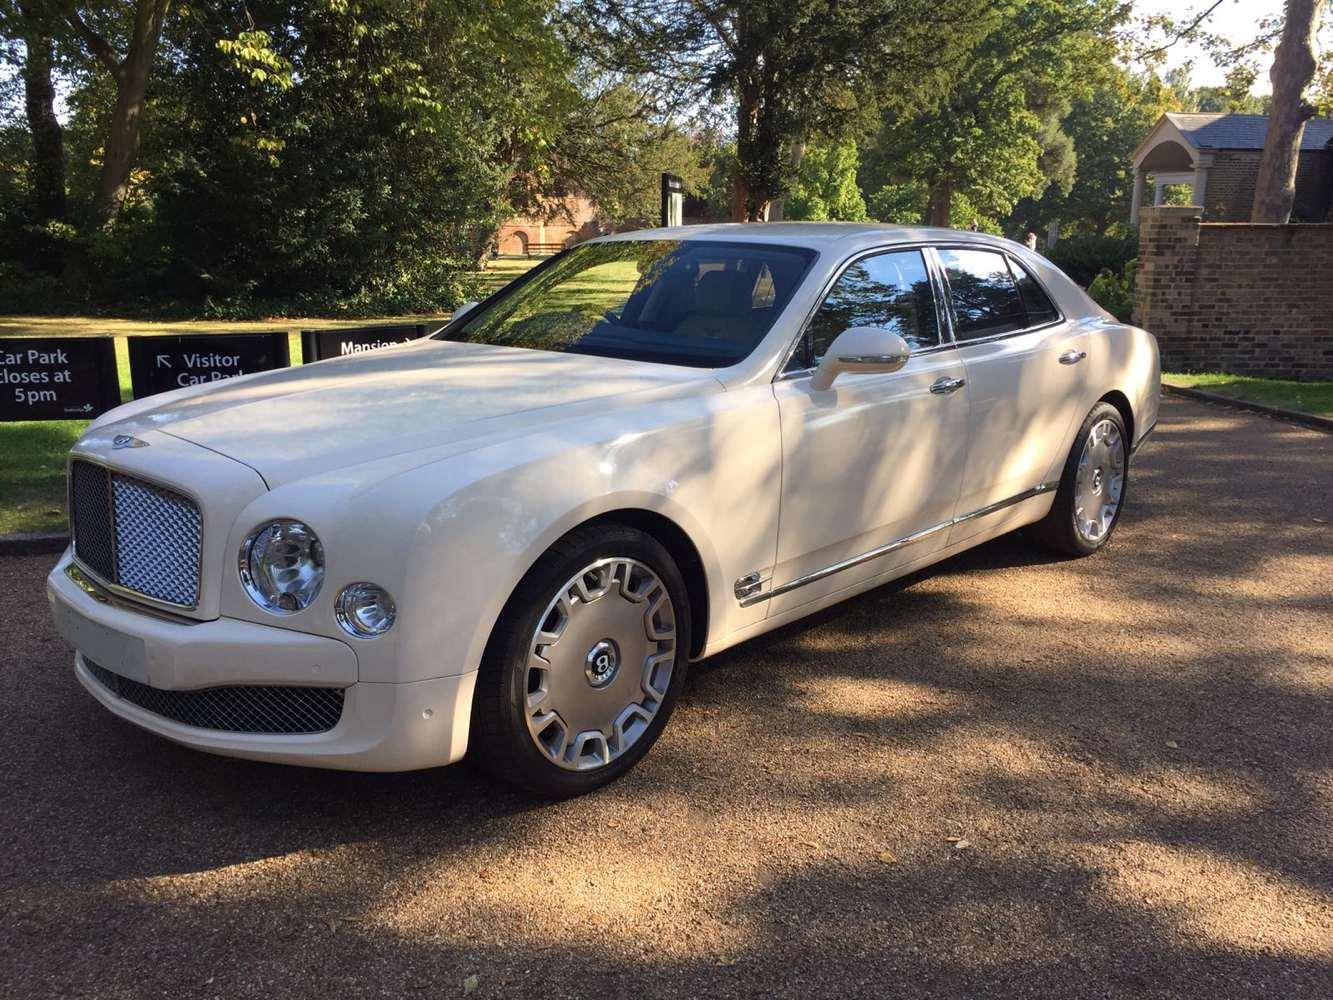 Bentley Mulsanne In White With Cream Leather Interior Gold Wedding Cars Wedding Car Hire Wedding Cars London Wedding Cars Bedford Wedding Cars Milton Keynes Classic Car